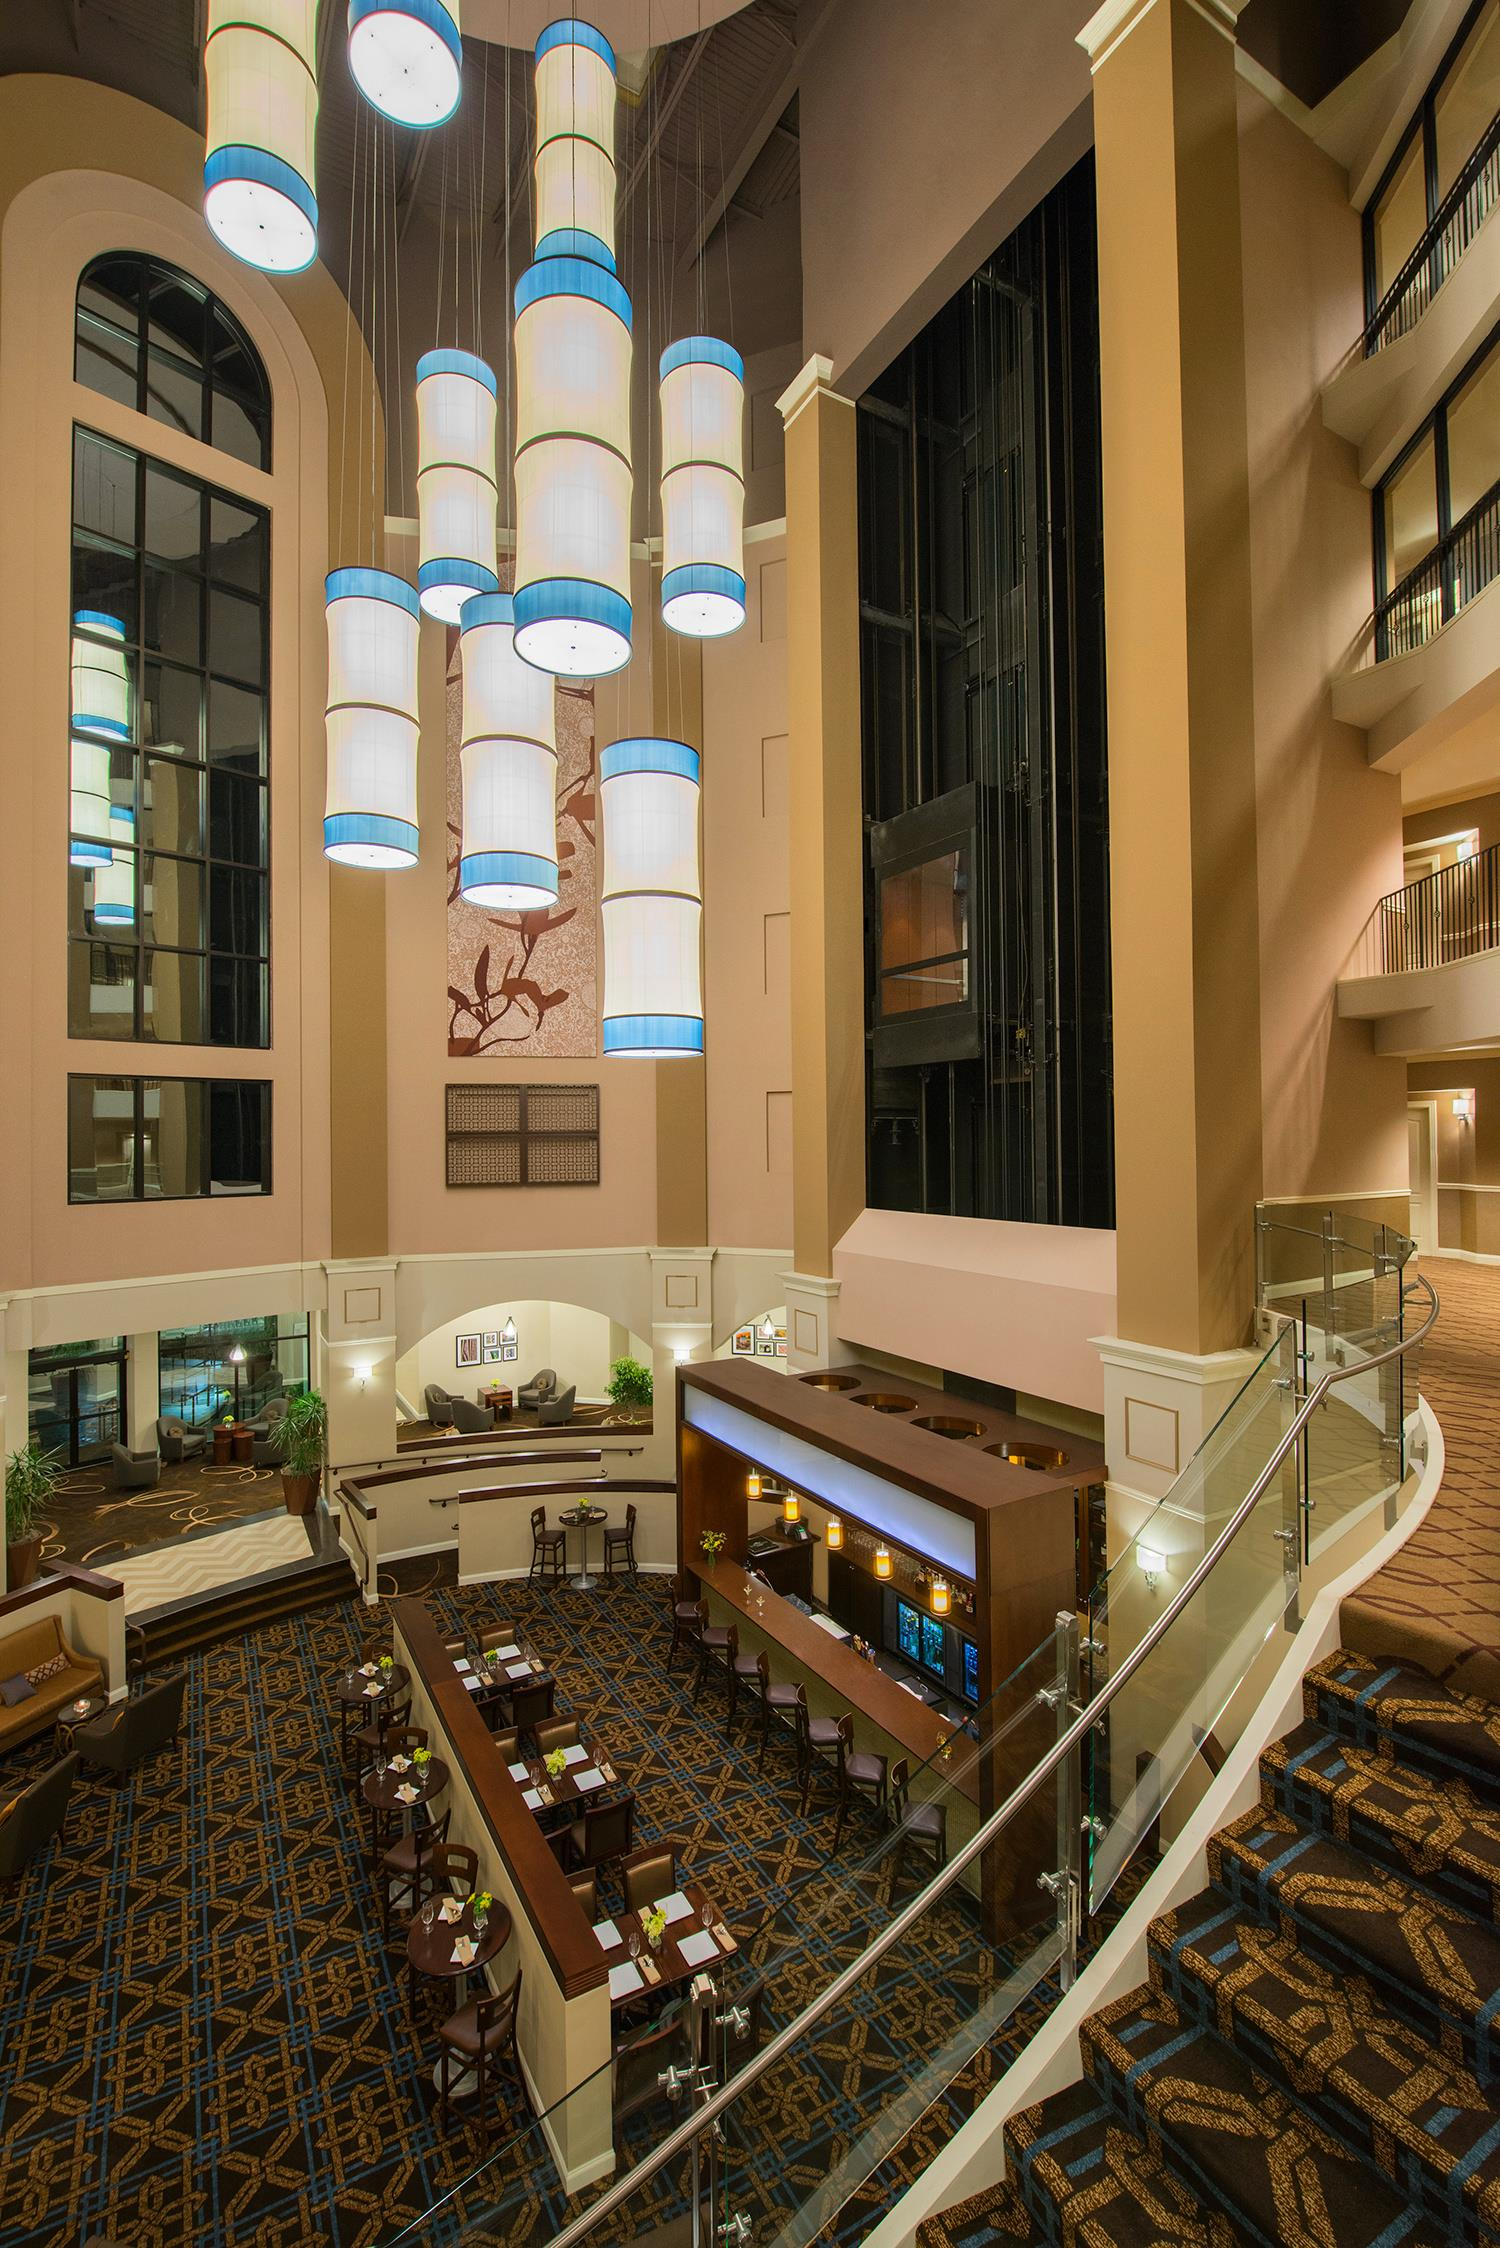 Sheraton Wilmington South Hotel image 22